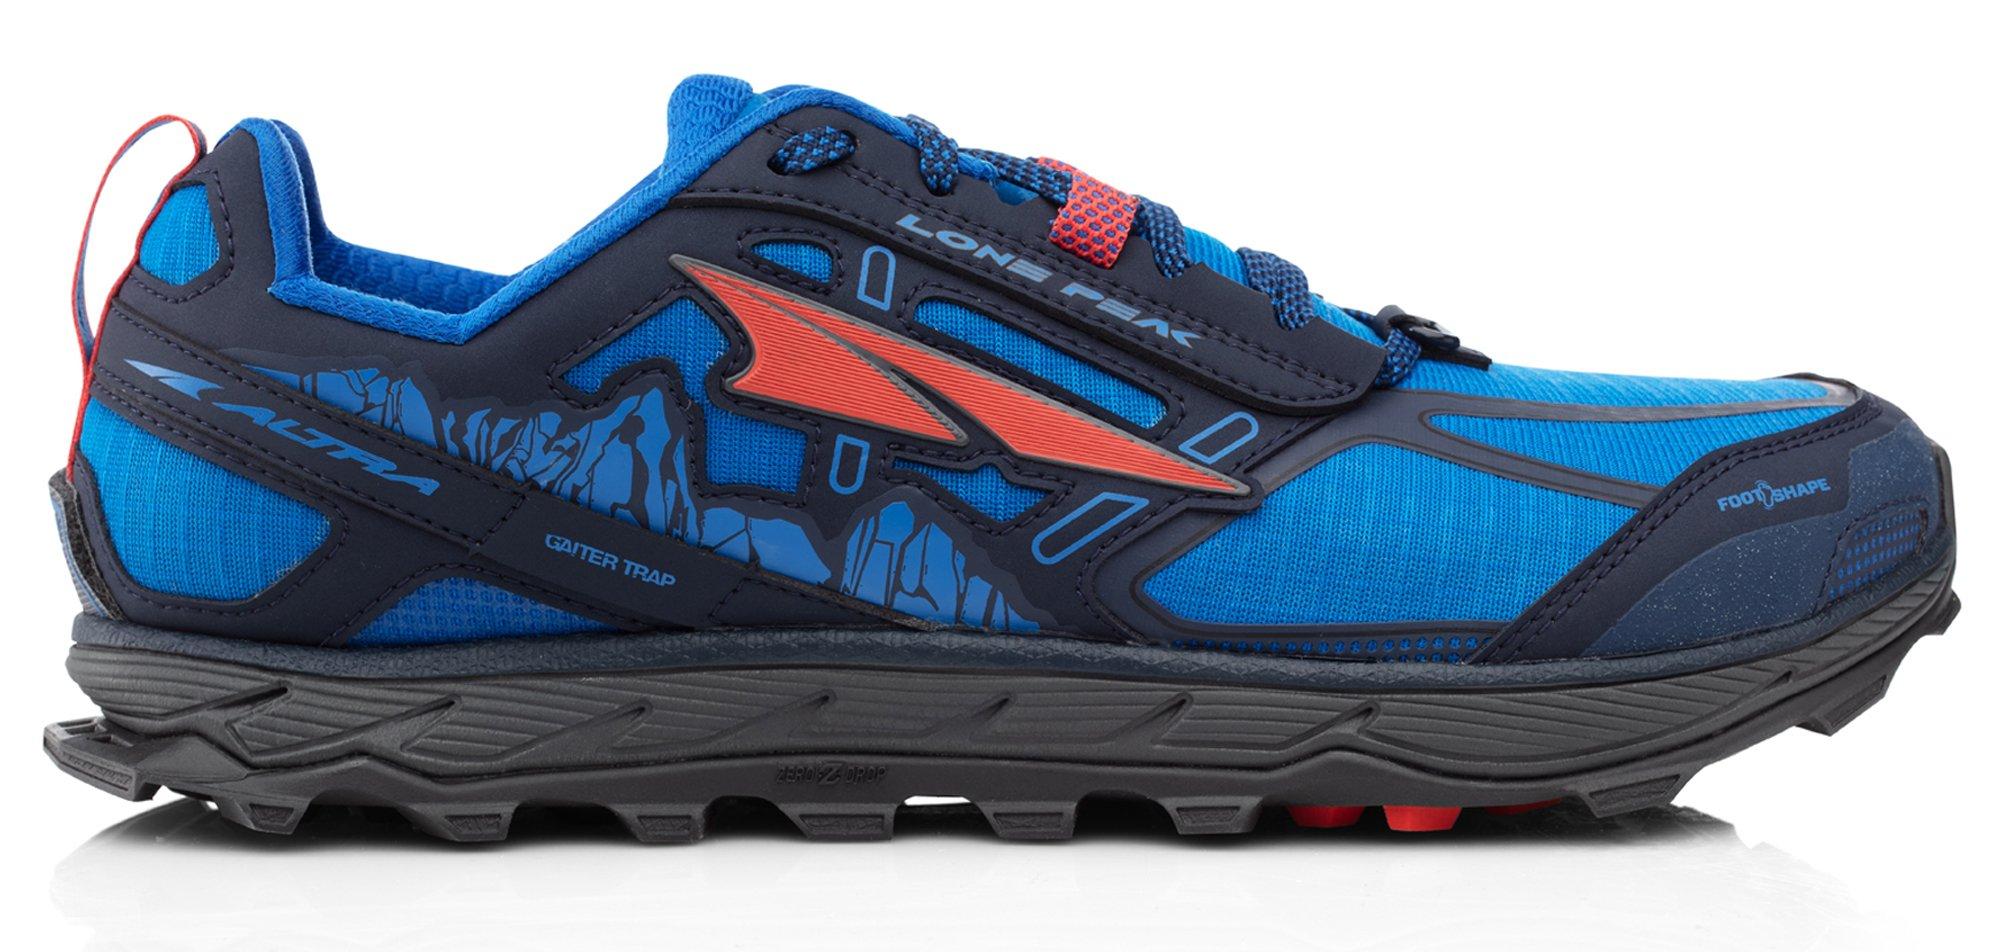 Altra AFM1855F Men's Lone Peak 4.0 Trail Running Shoe, Blue - 10 D(M) US by Altra